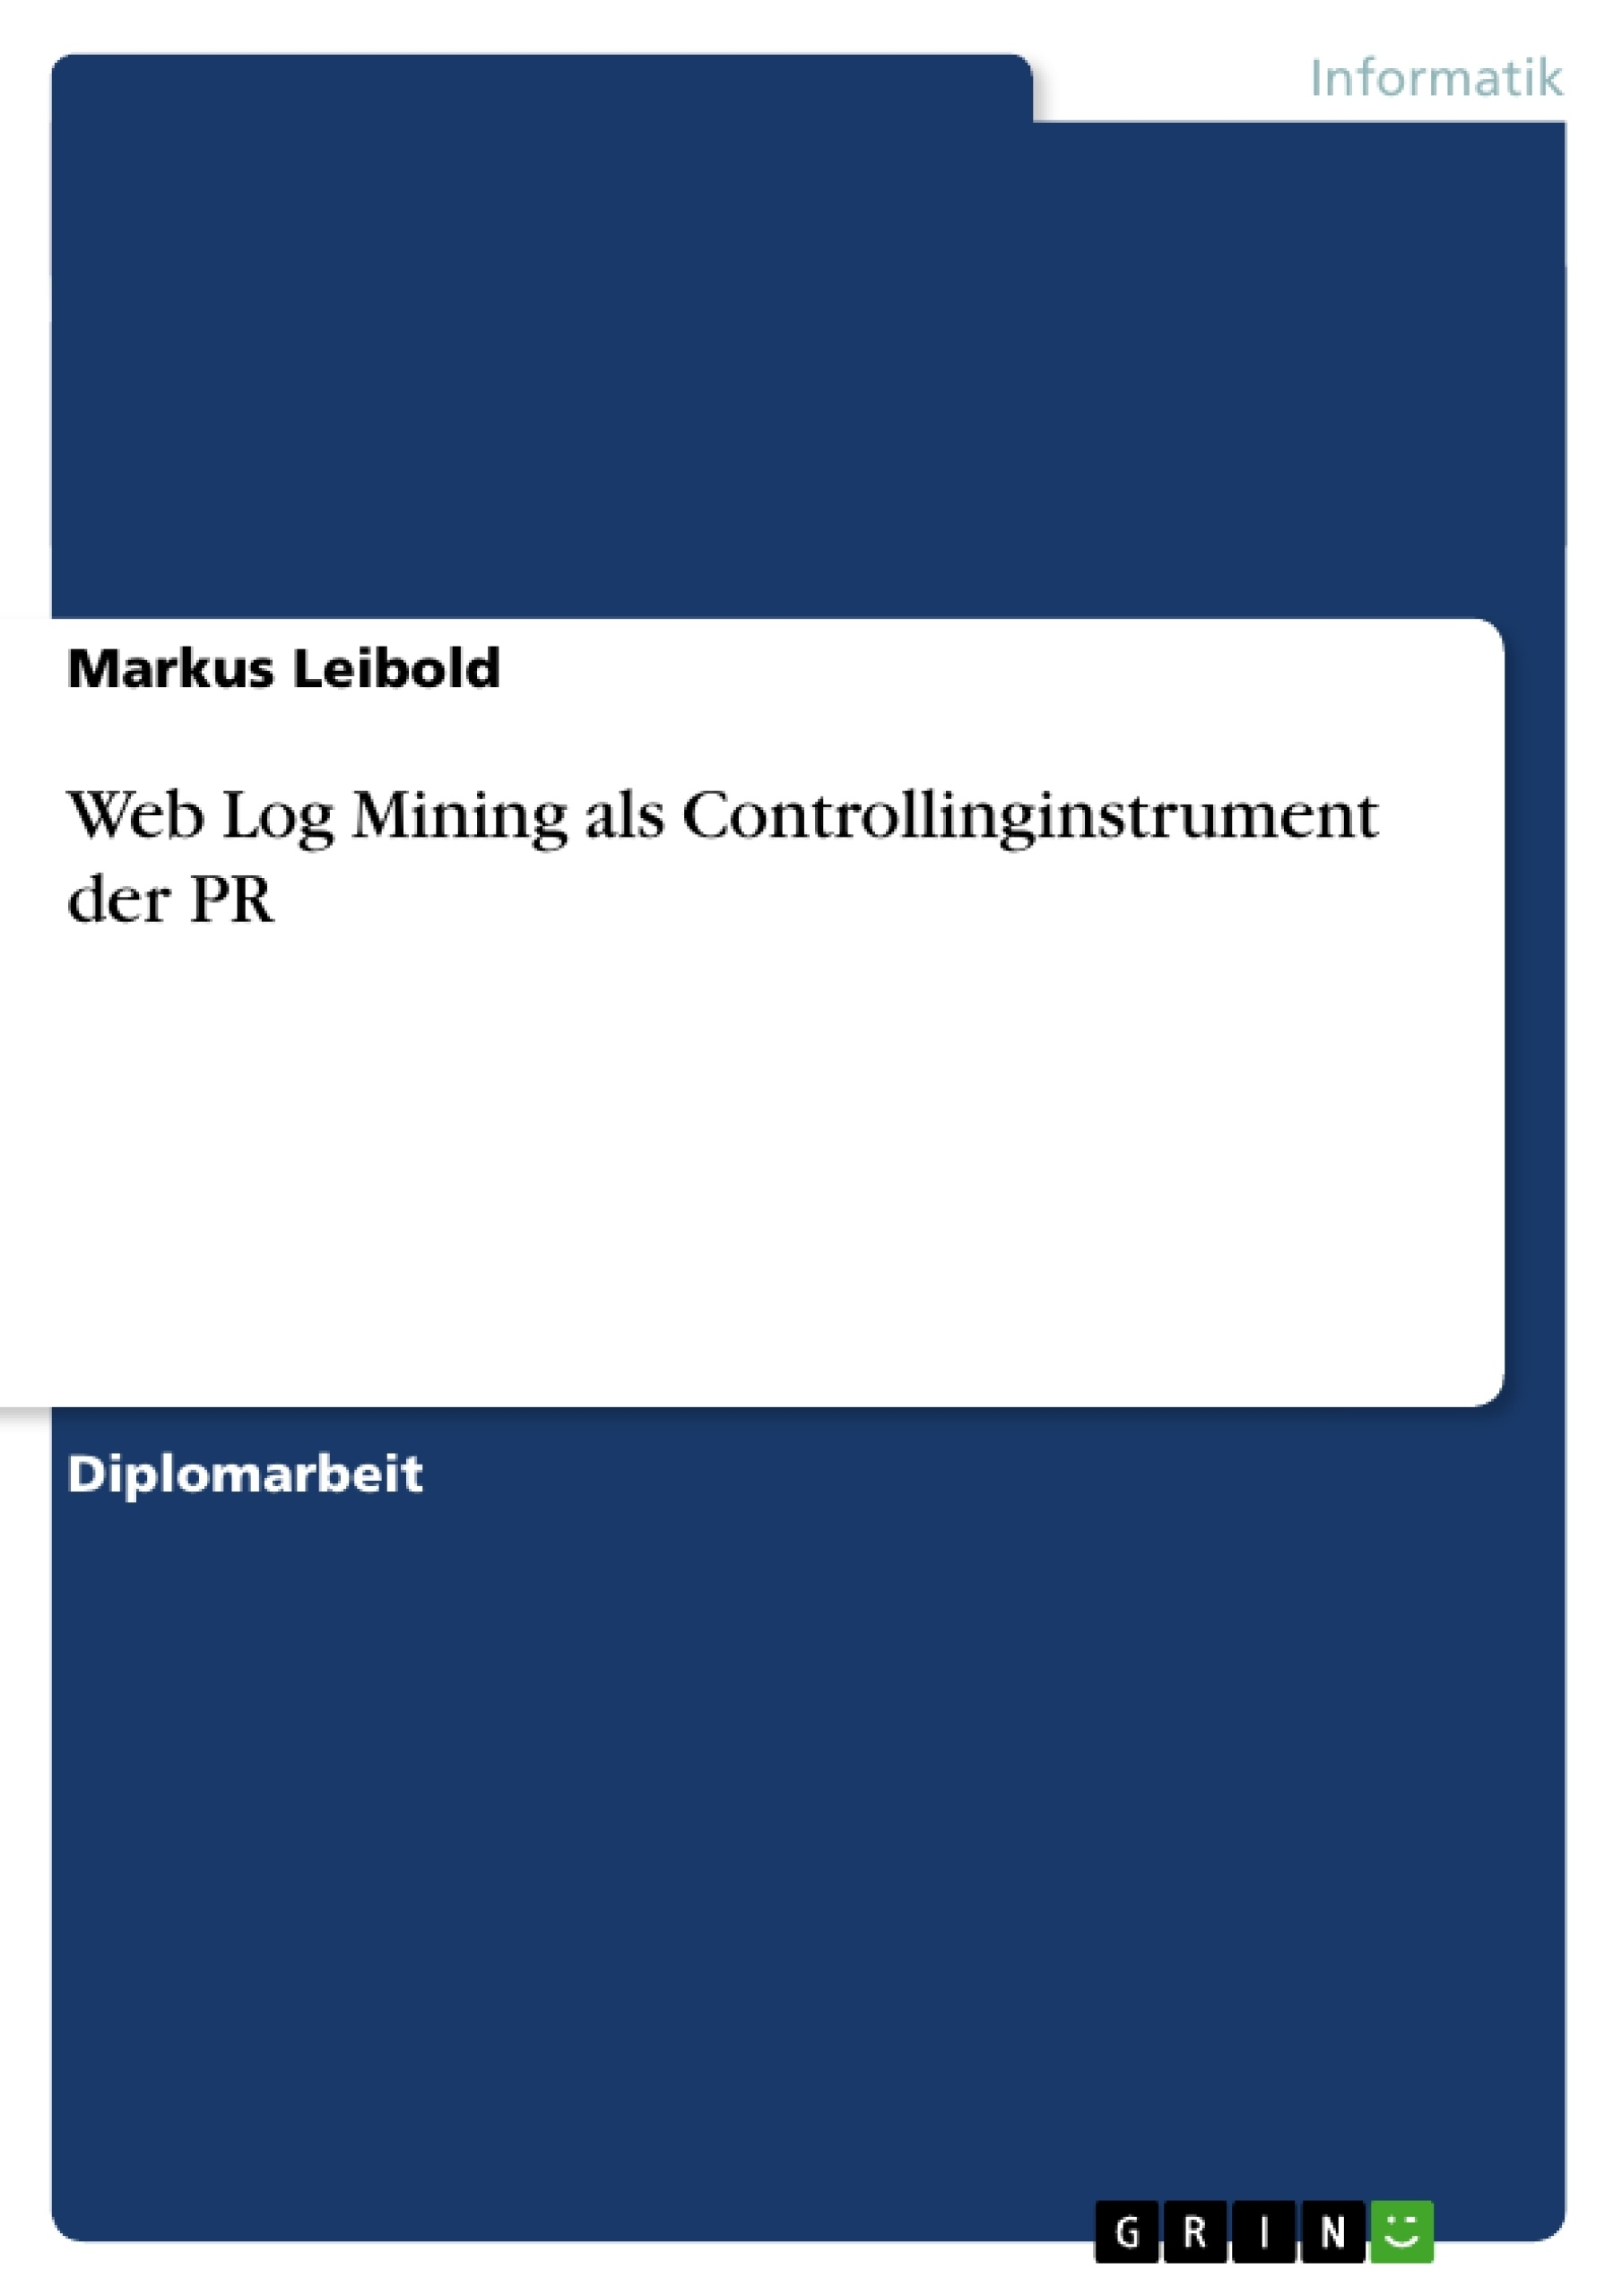 Titel: Web Log Mining als Controllinginstrument der PR